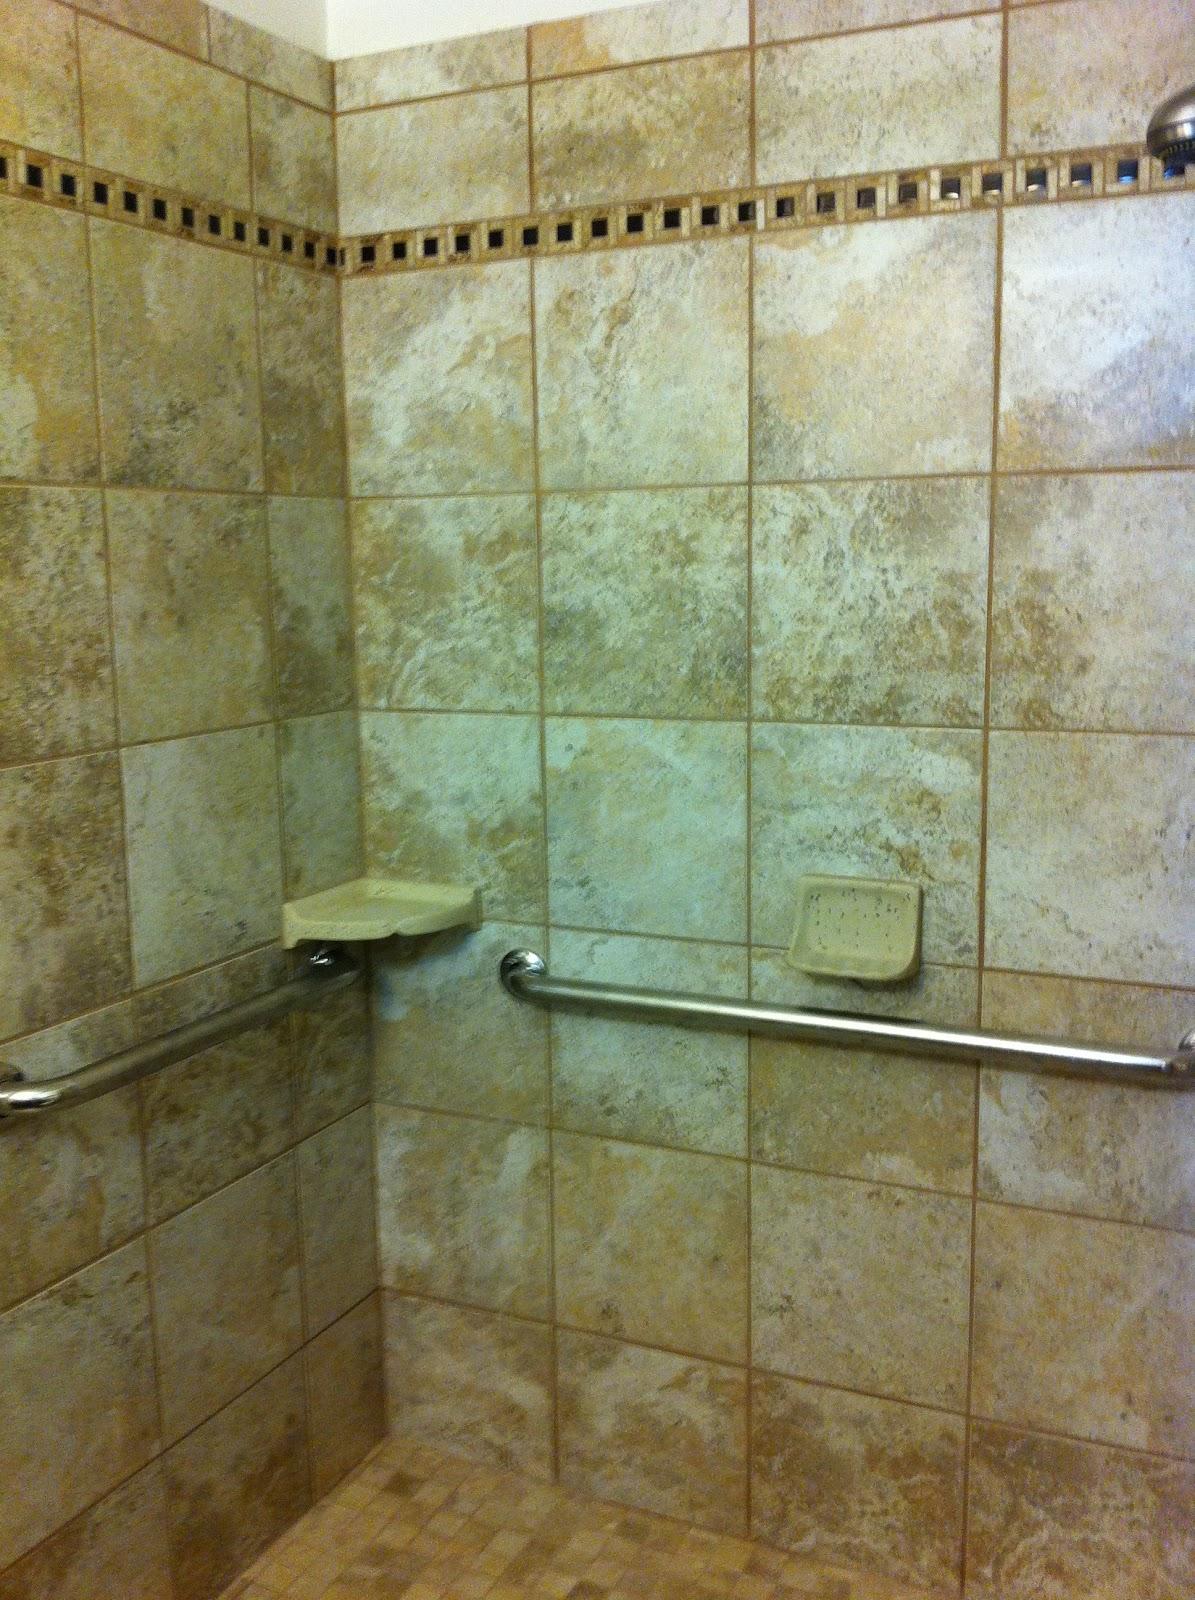 Lapham Construction: Bathroom Remodel With Custom Shower ...